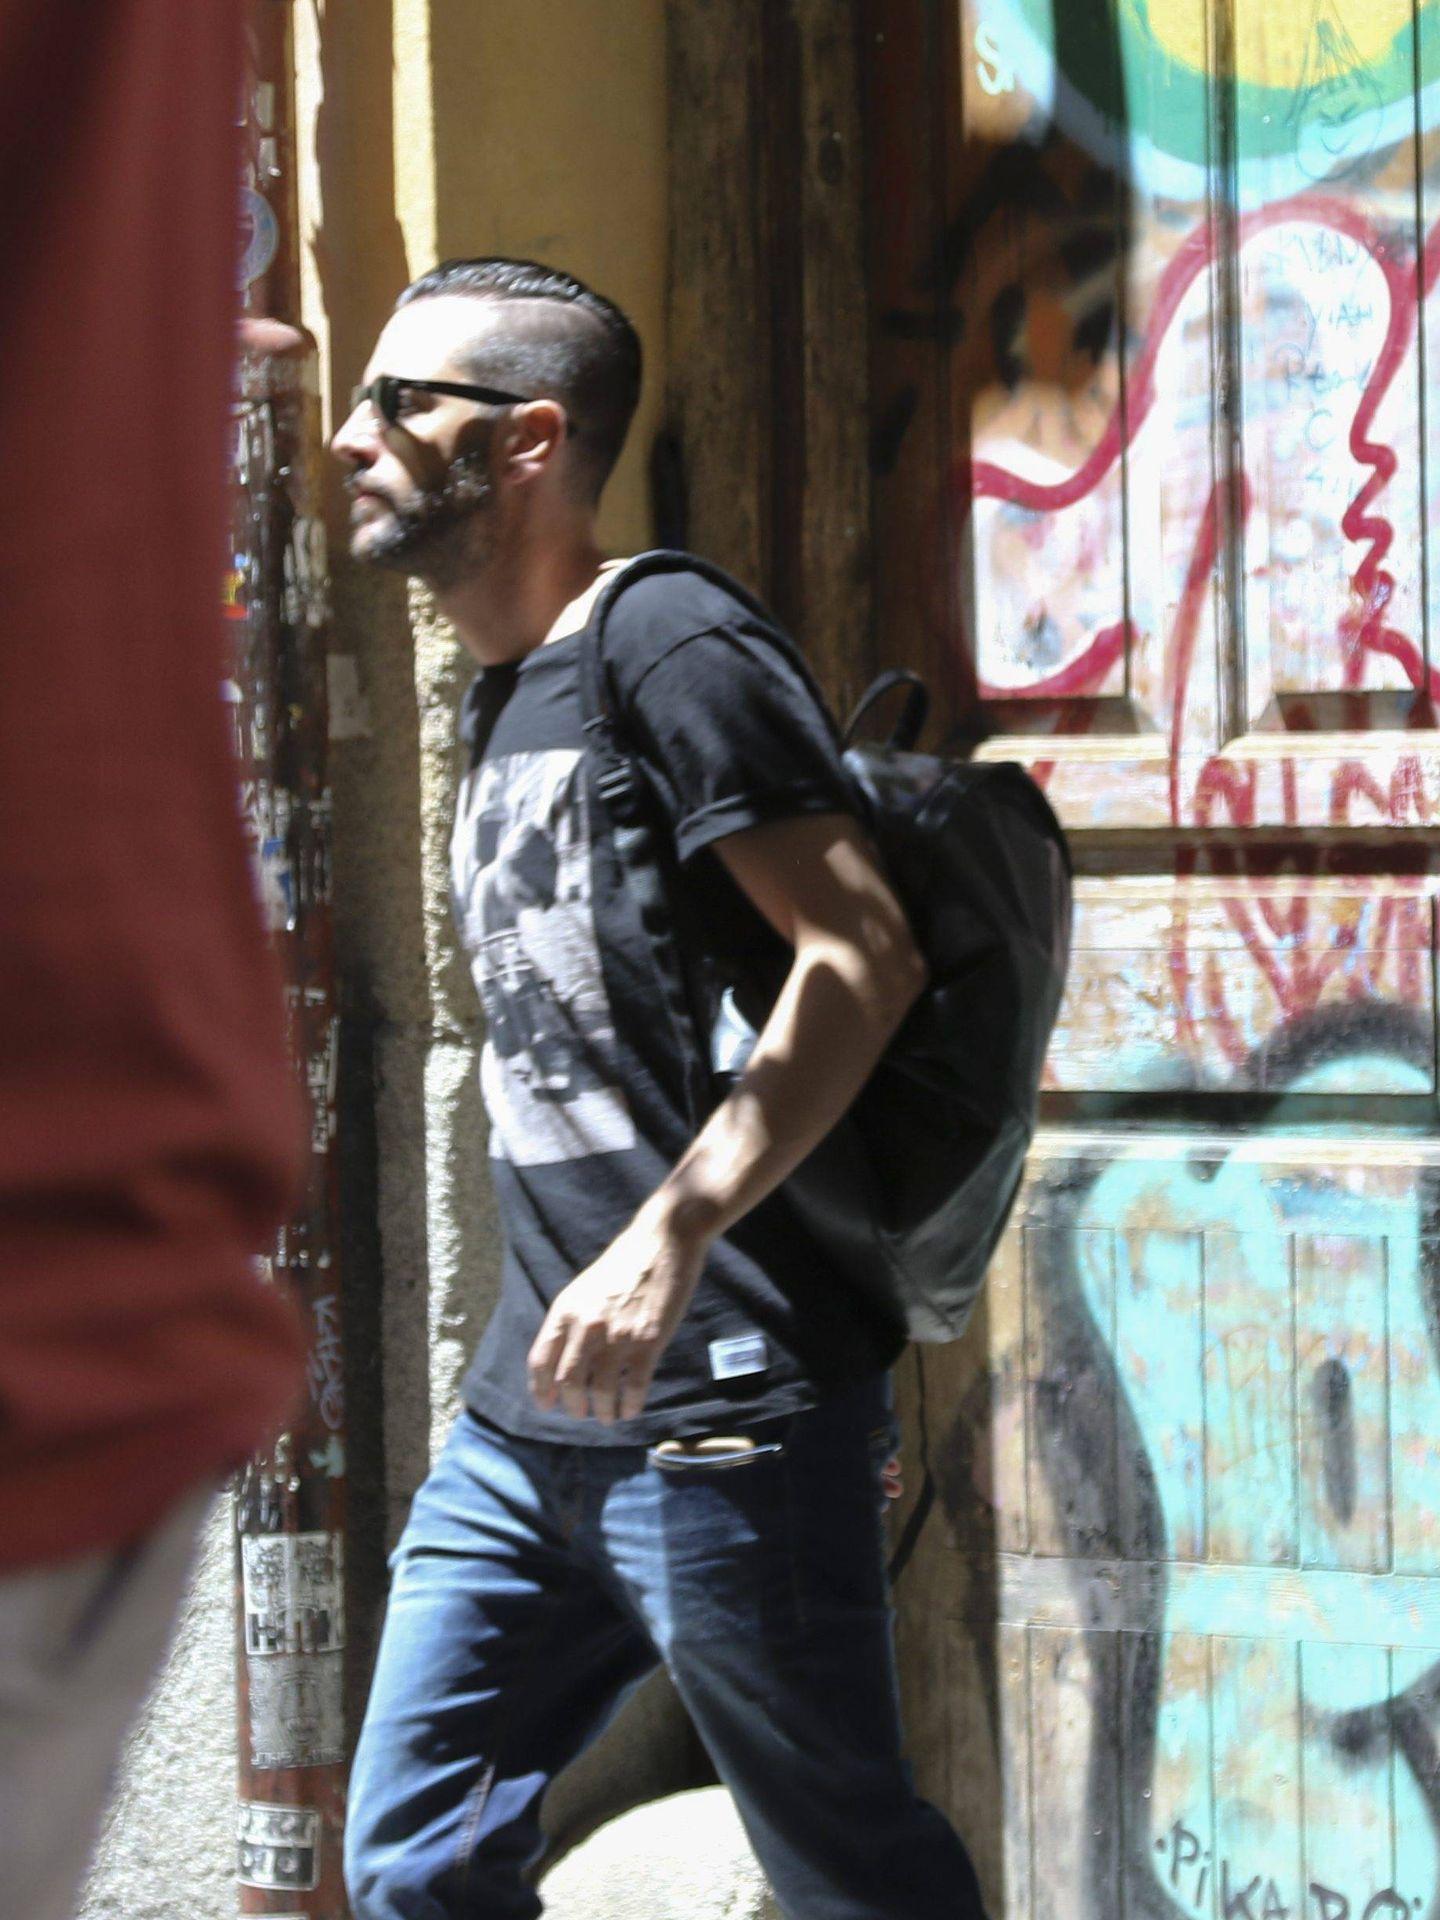 Dani Mateo, por las calles de Madrid. (Cordon Press)